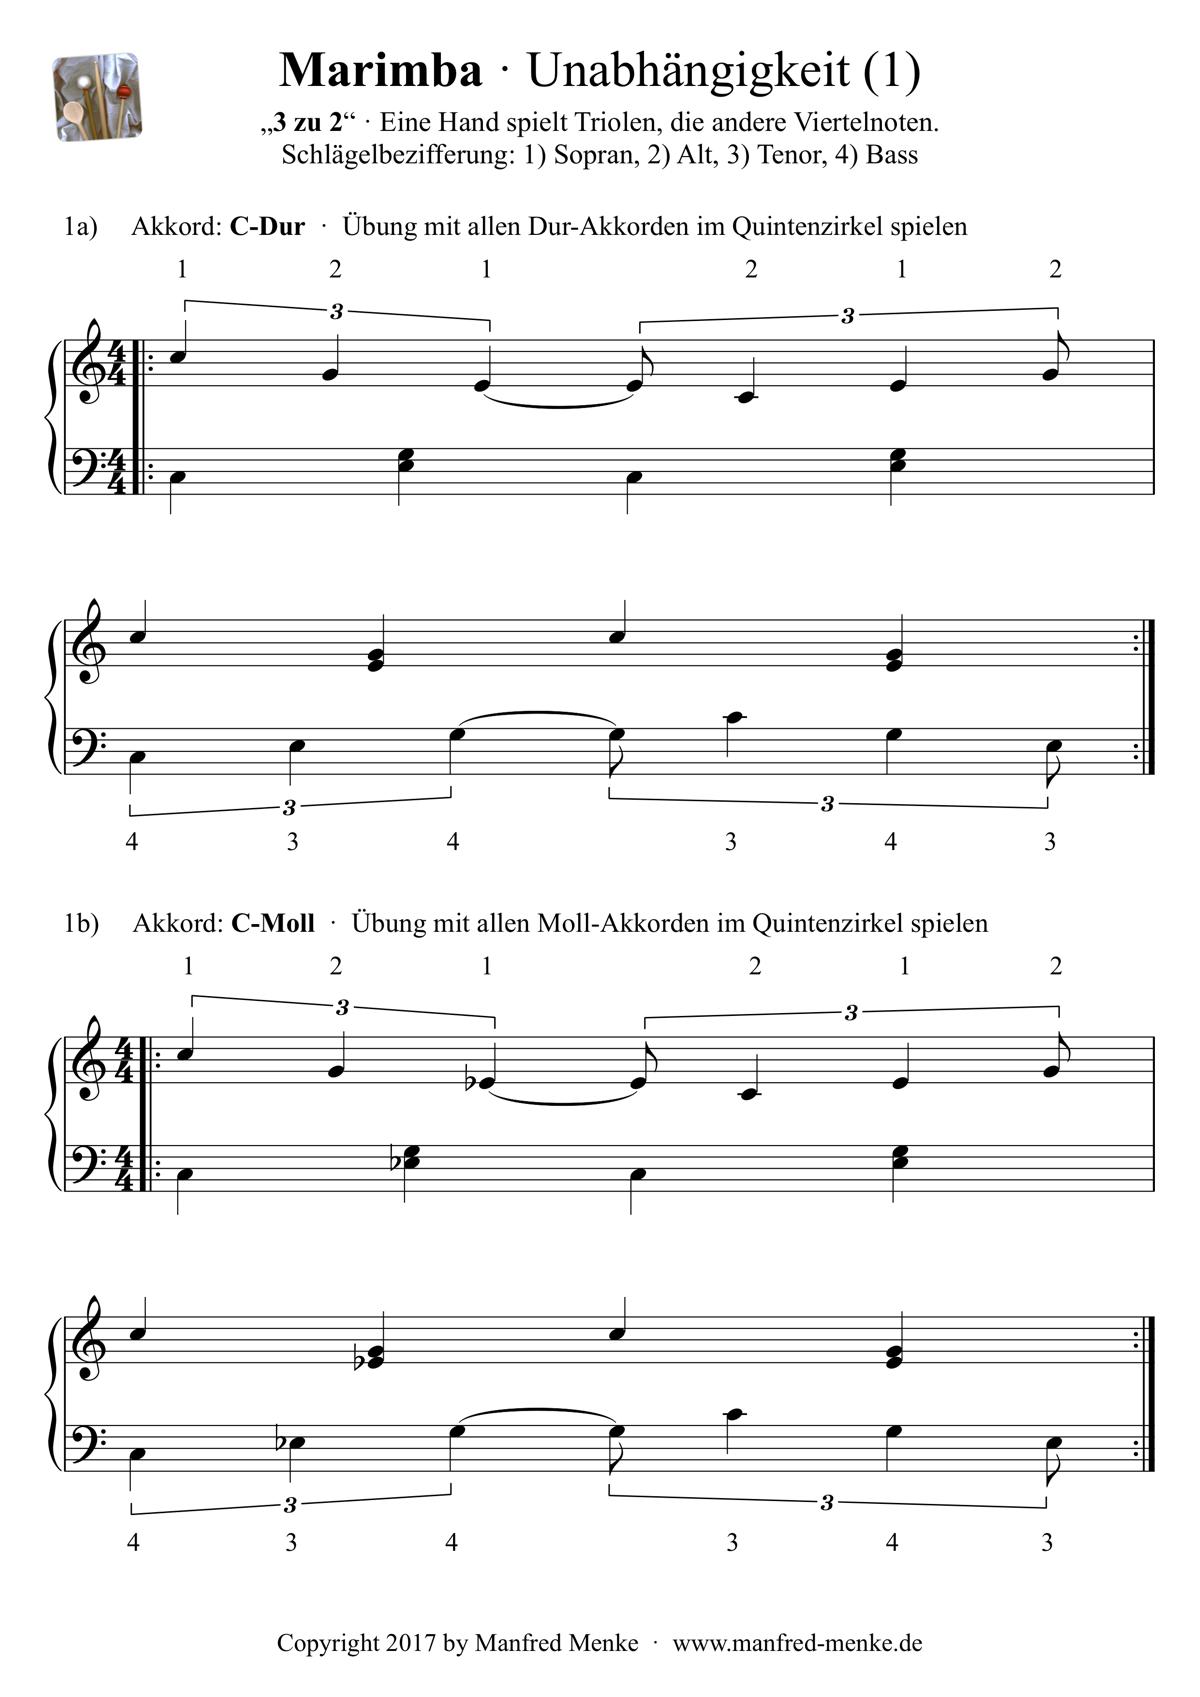 Marimba · Unabhaengigkeit (Seite 1)